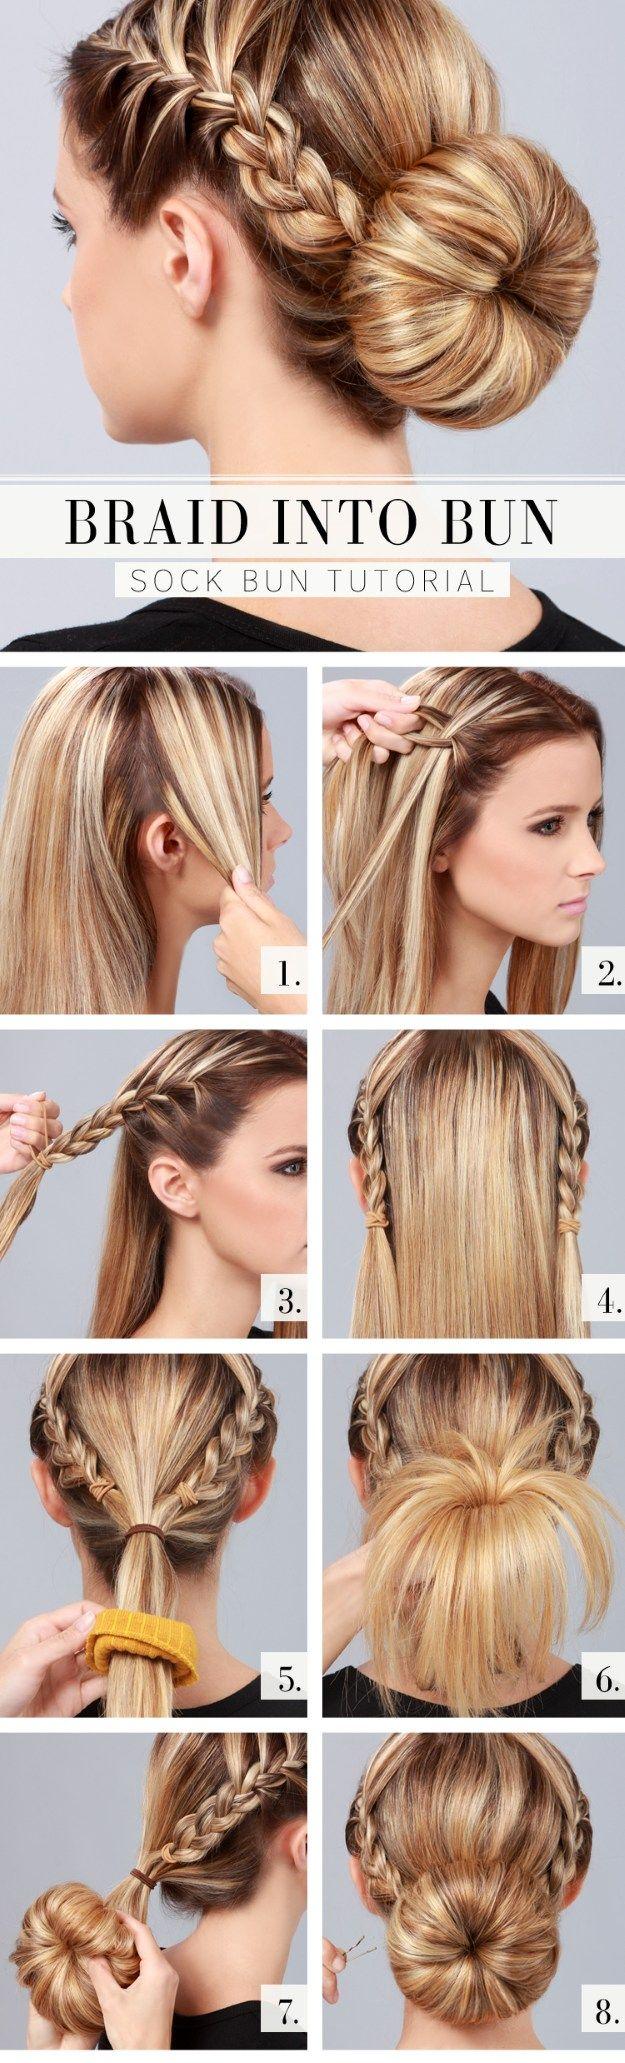 Braids and Bun Prom Hair Tutorial   Cute Hairstyles by Makeup Tutorials at  make...